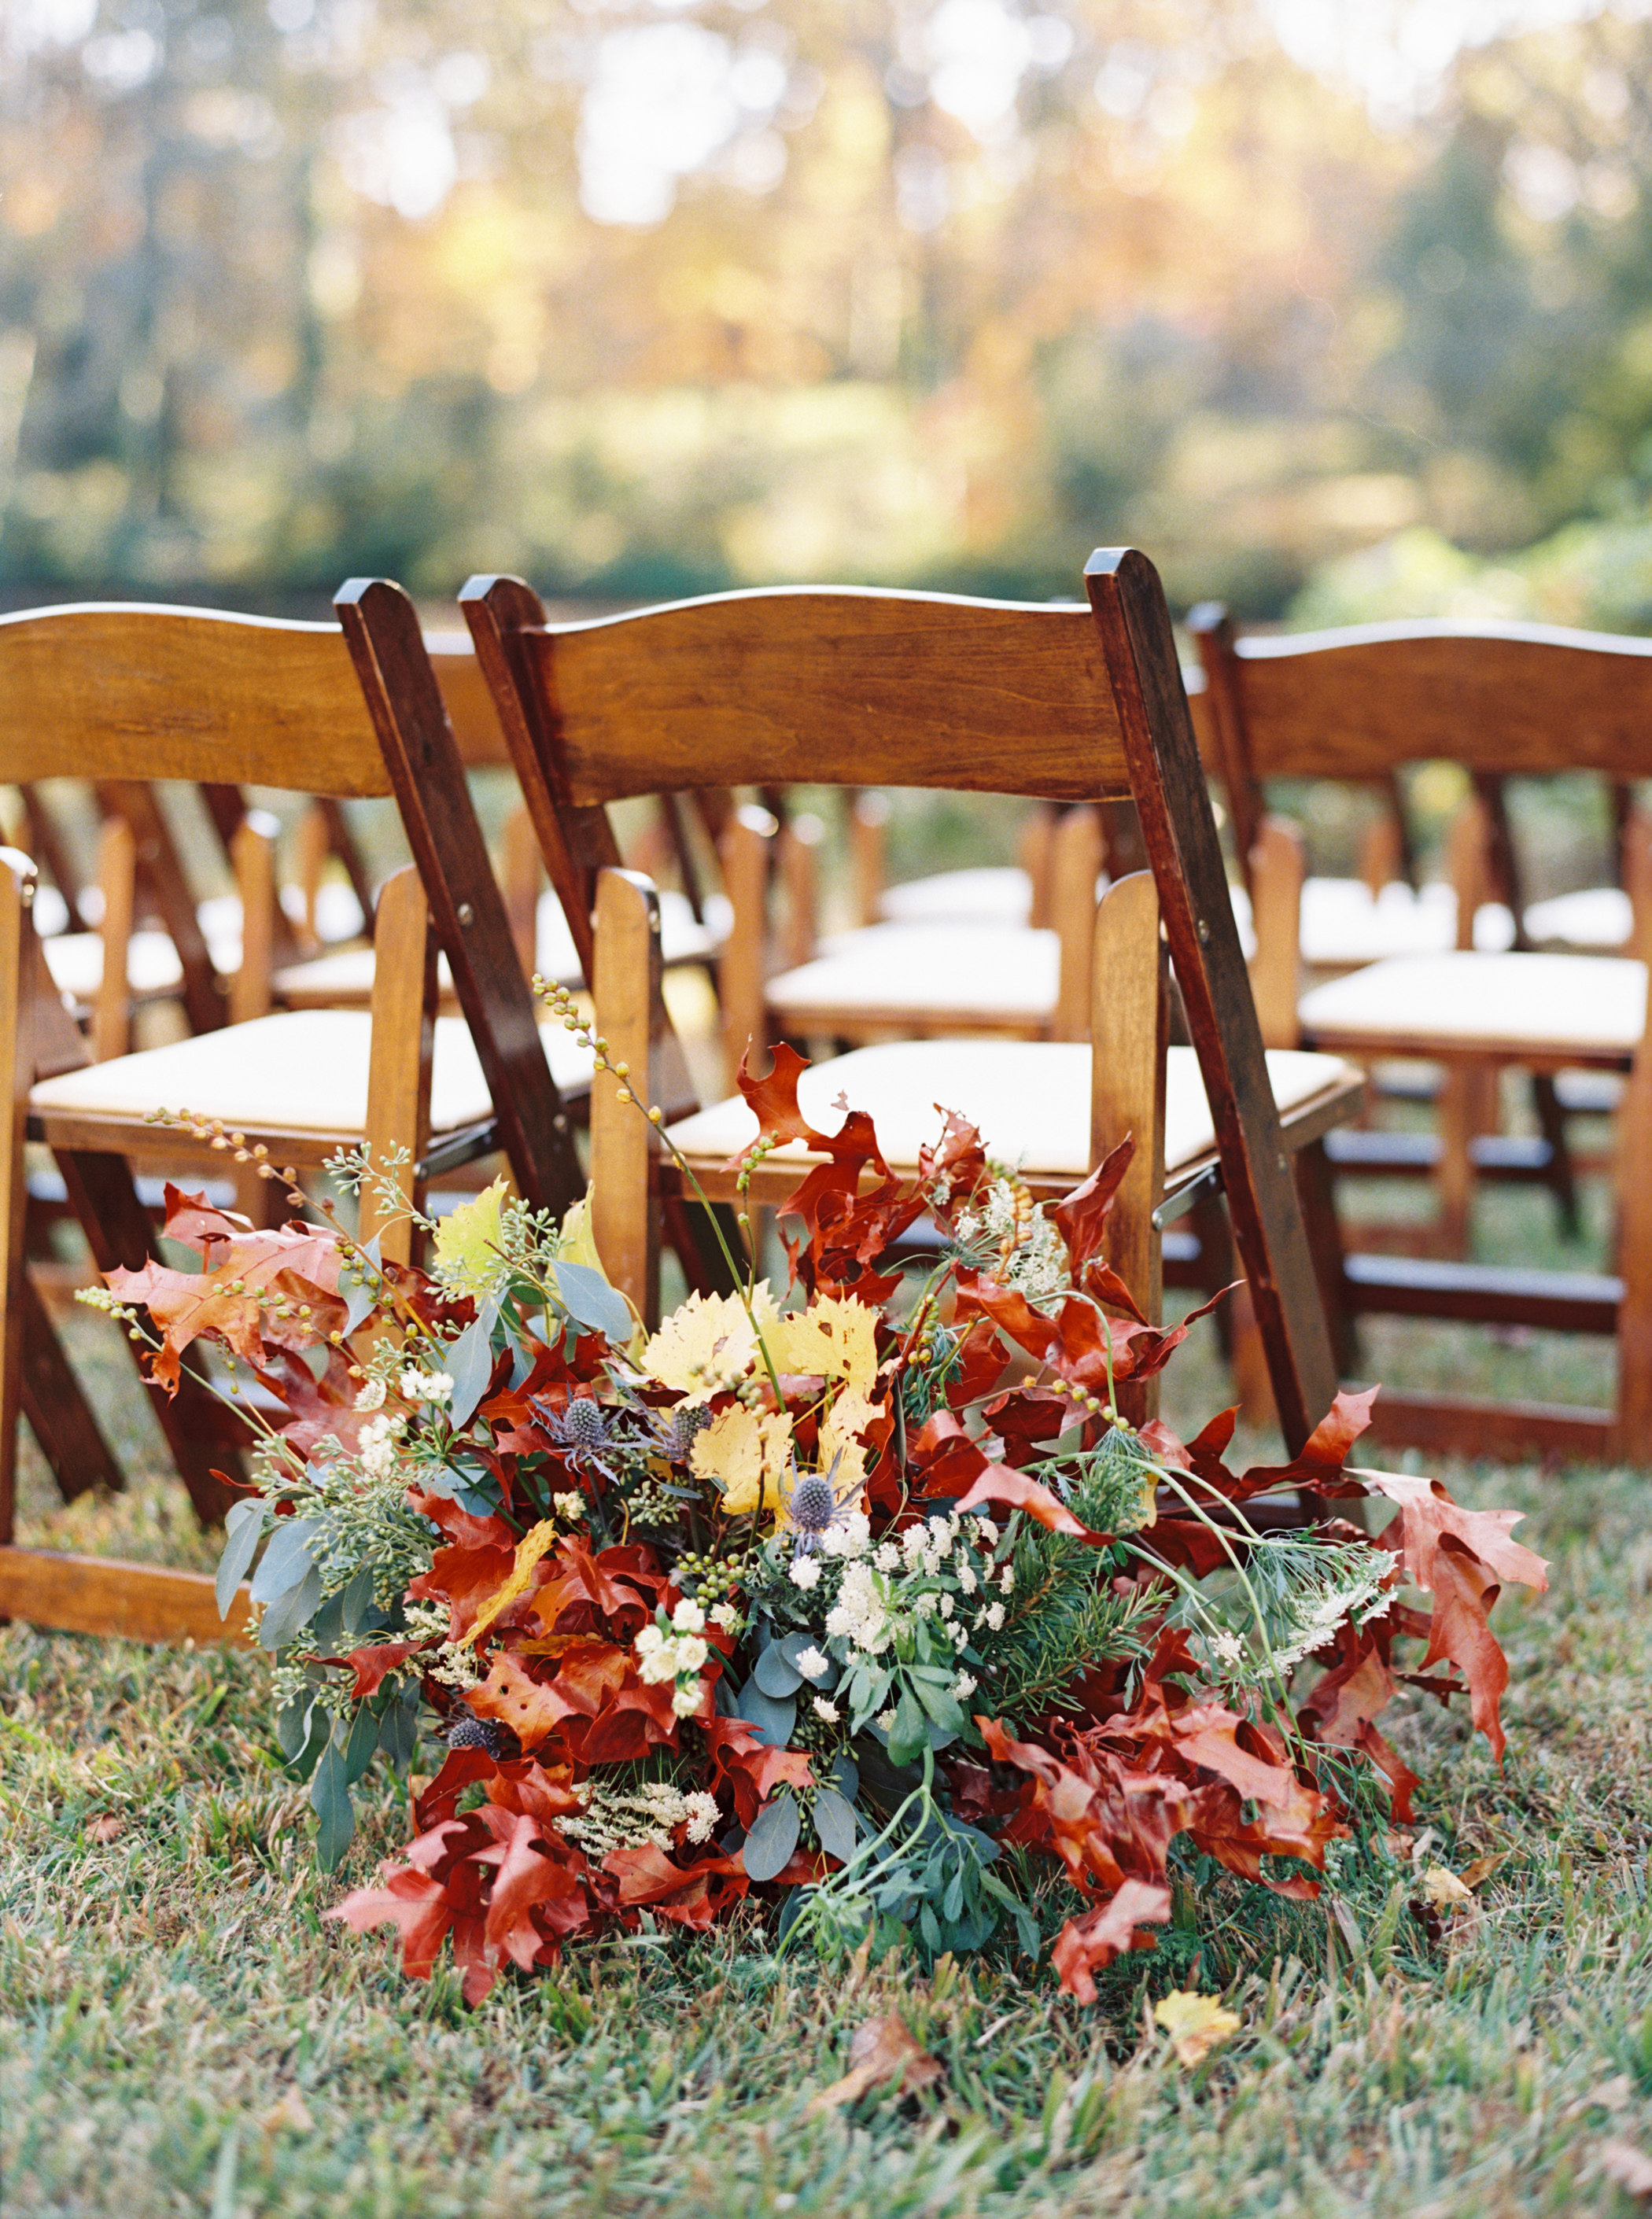 Colorful fall leaf arrangement behind chair